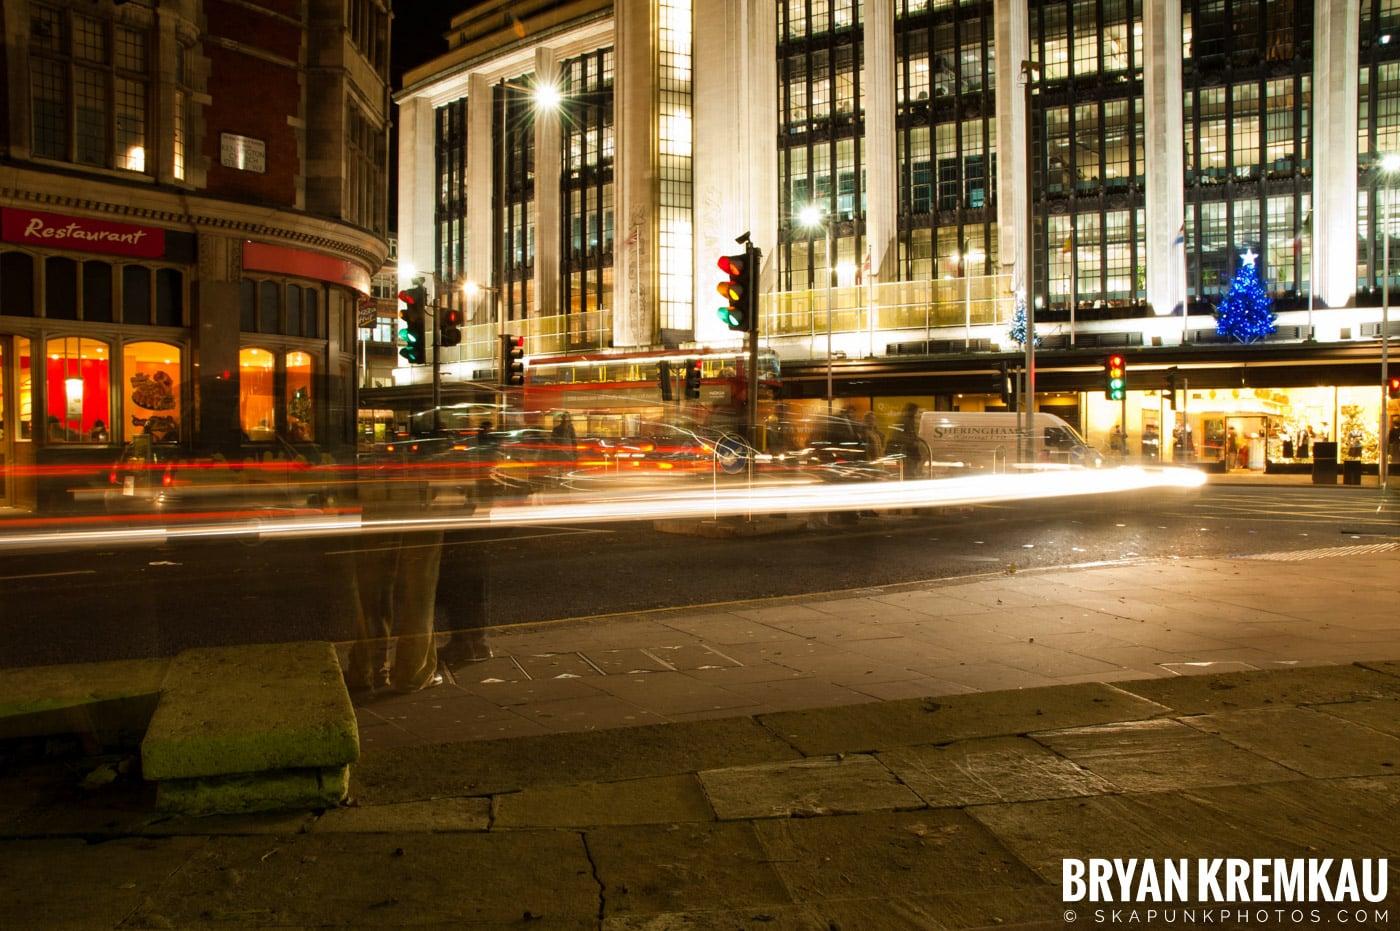 London, England - Day 1 - 12.8.06 (7)